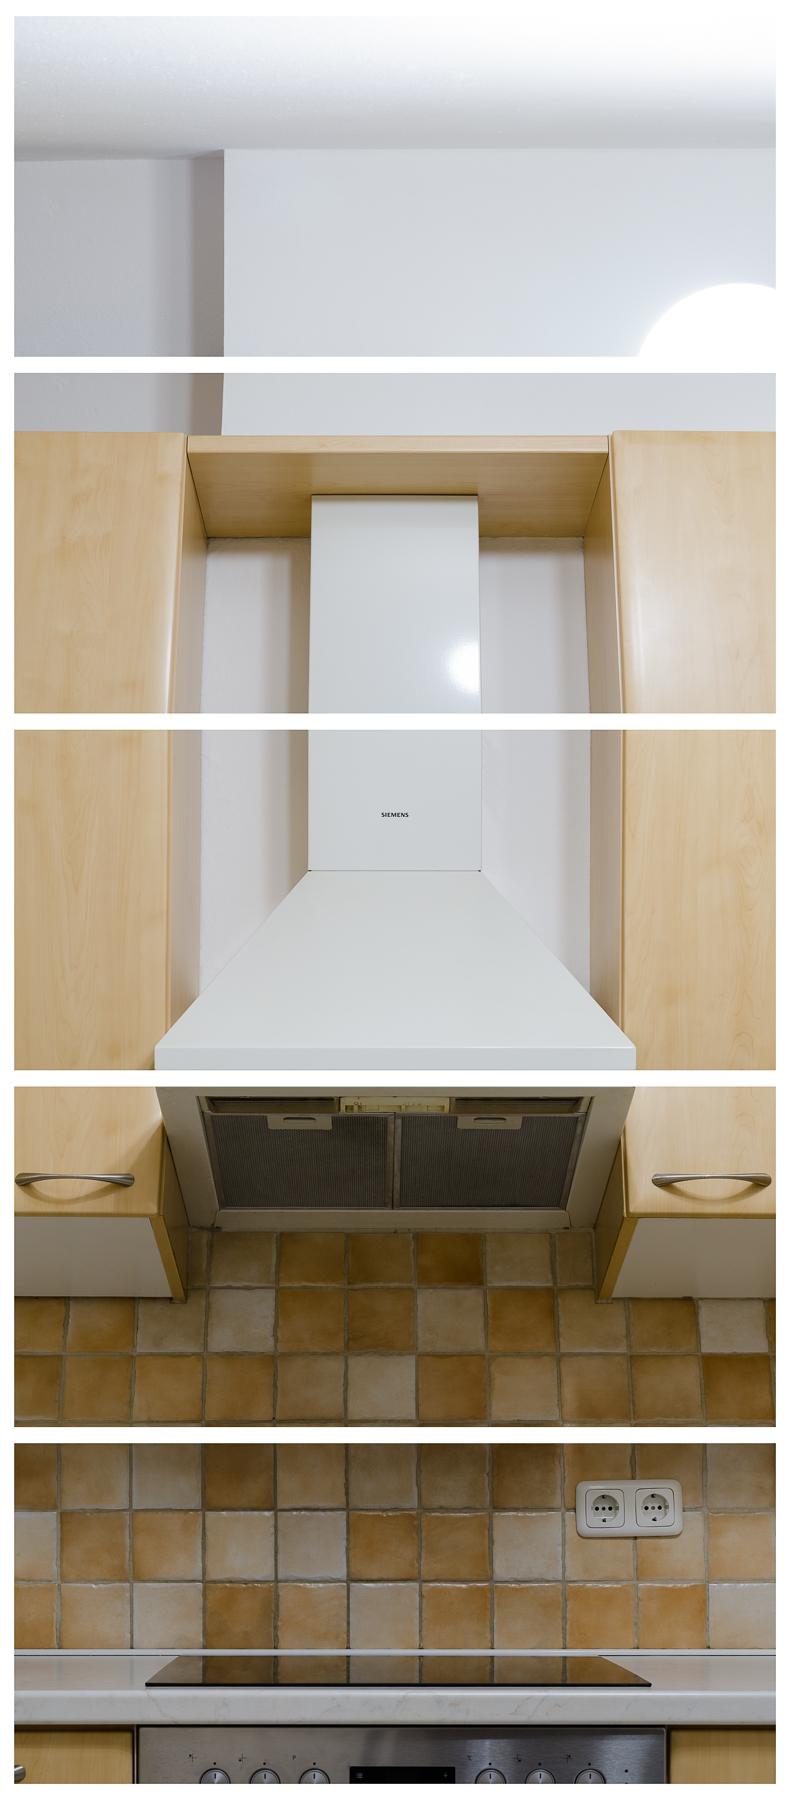 Dunstabzugshaube, 2017 Inkjet-Pigmentdruck 5-teilig zu je 95 × 42,5 cm